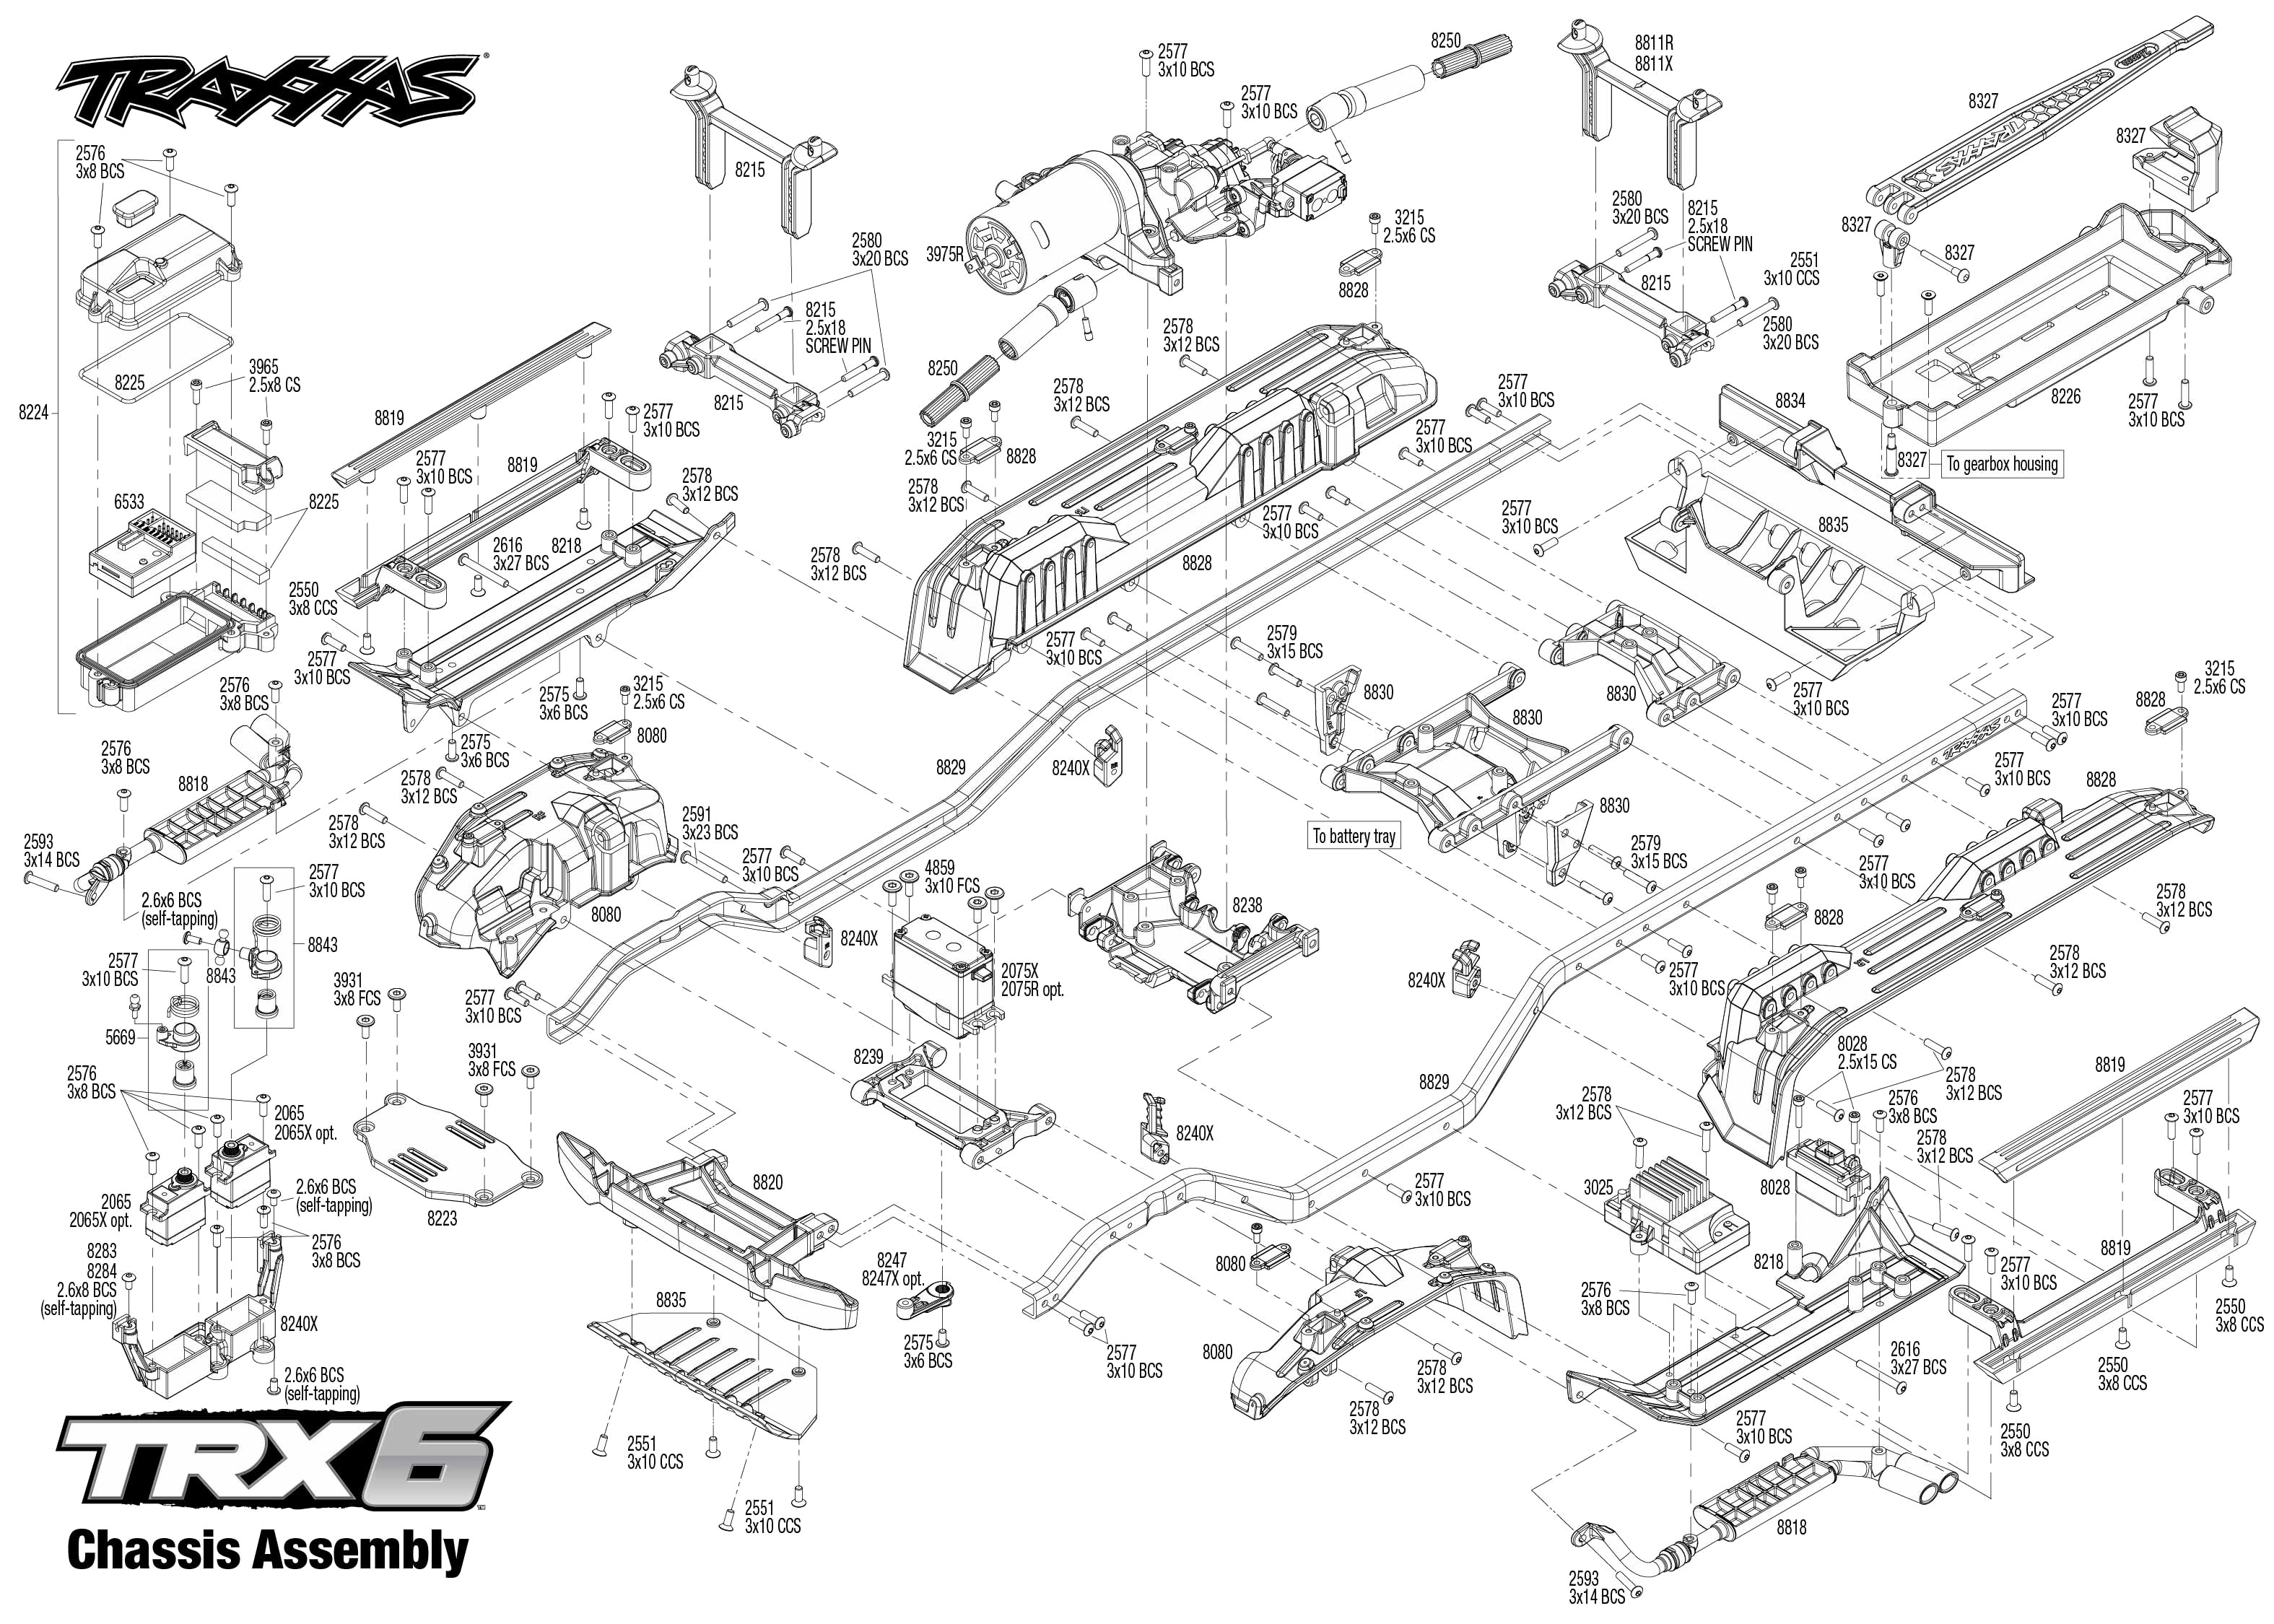 Exploded view: Traxxas TRX-6 Mercedes G 63 6x6 1:10 TQi